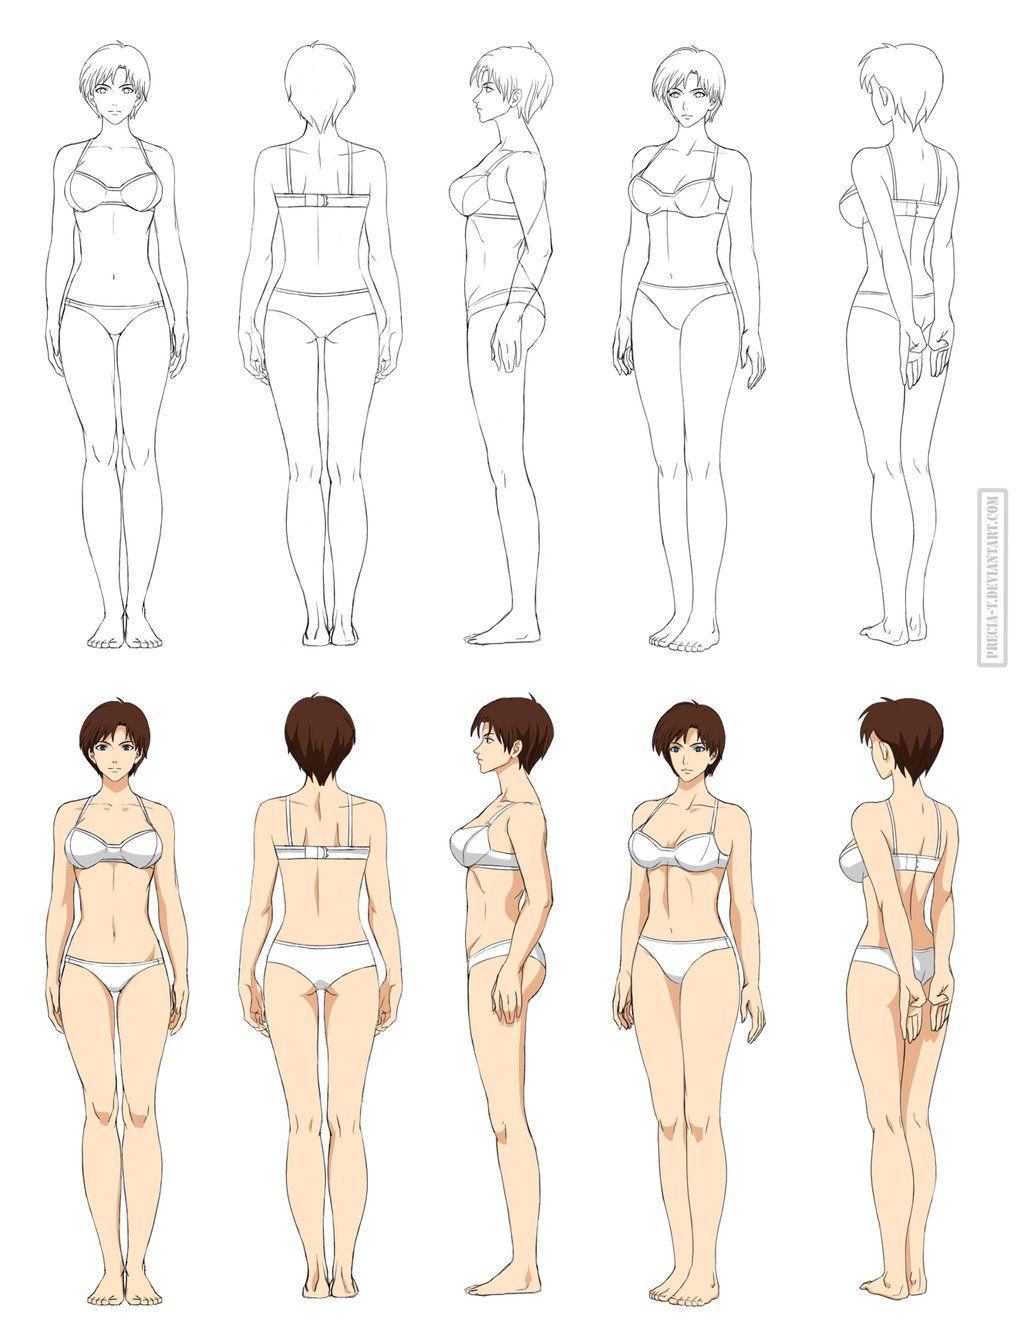 Anime anatomy, full body (commission) by Precia-T.deviantart.com on ...